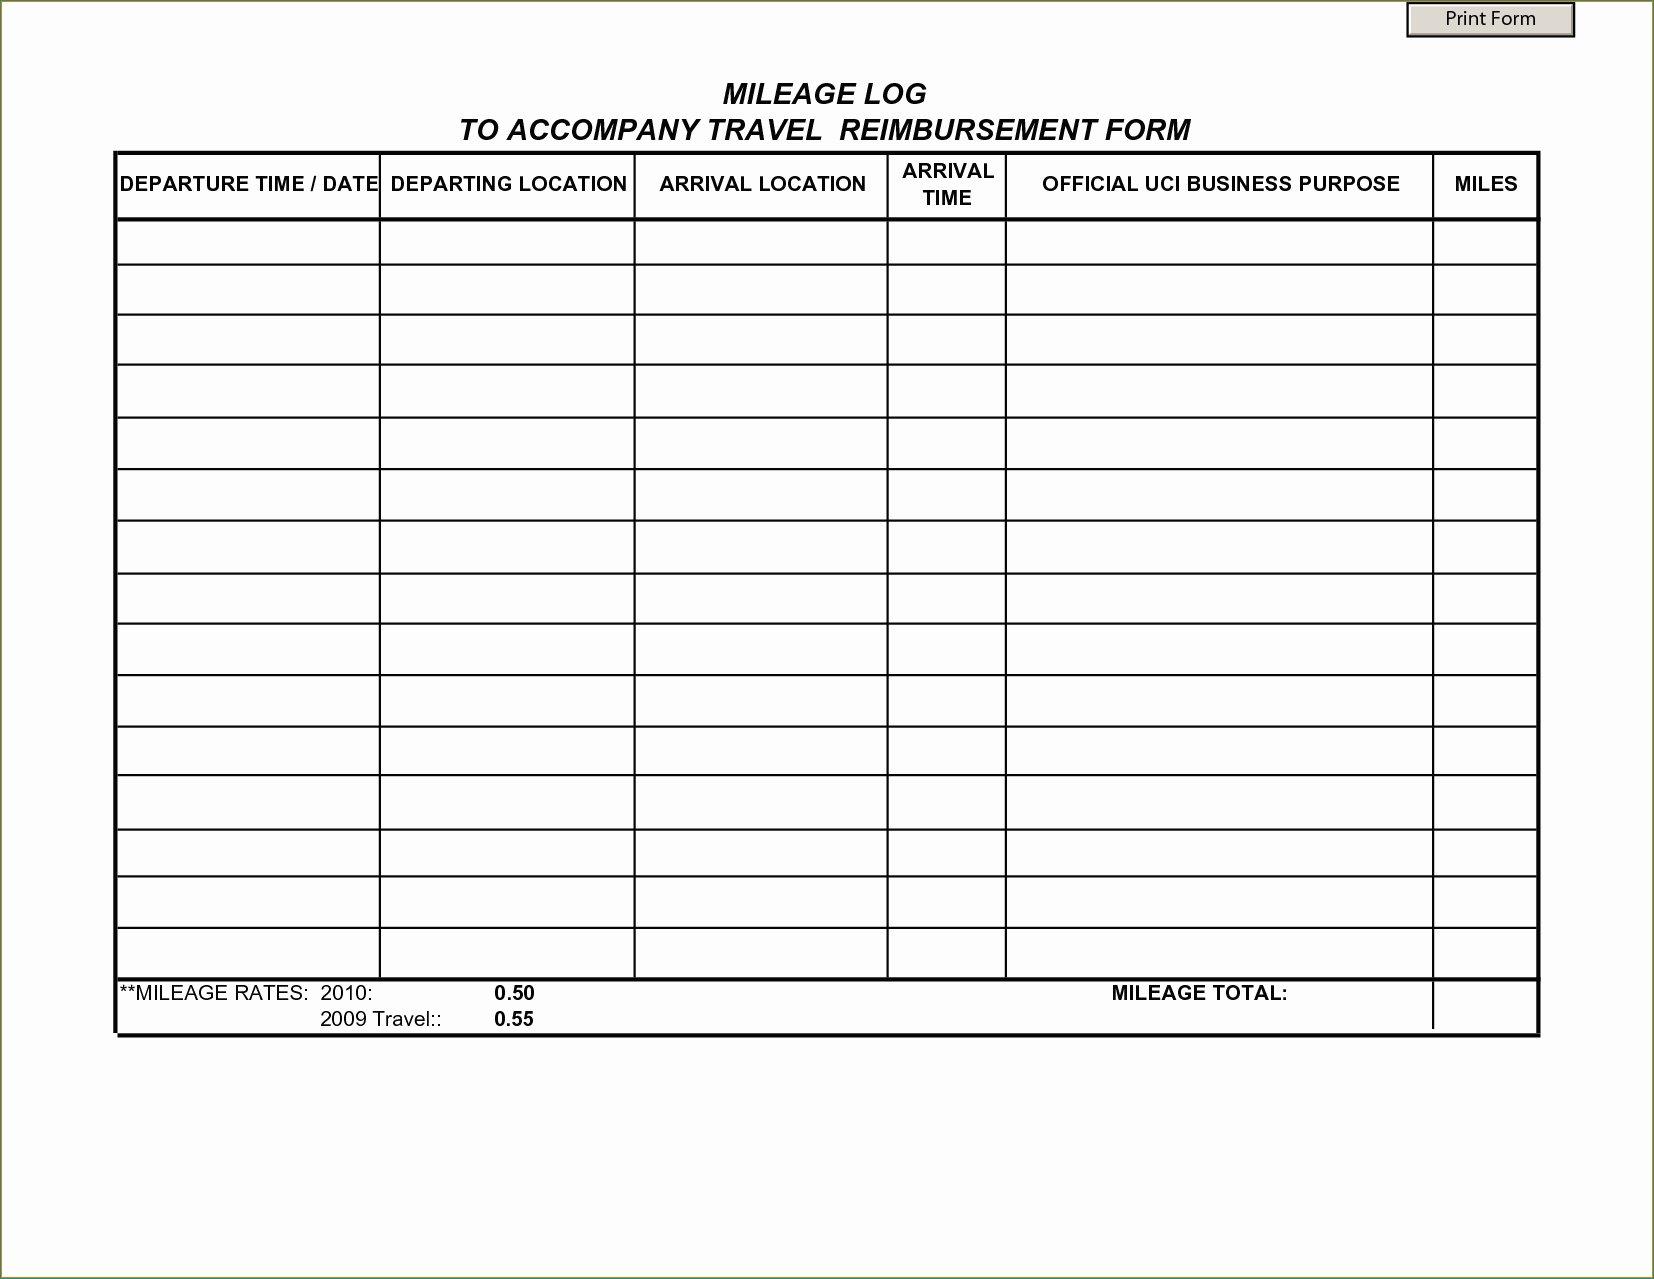 Online Mileage Log Spreadsheet within Mileage Form ...